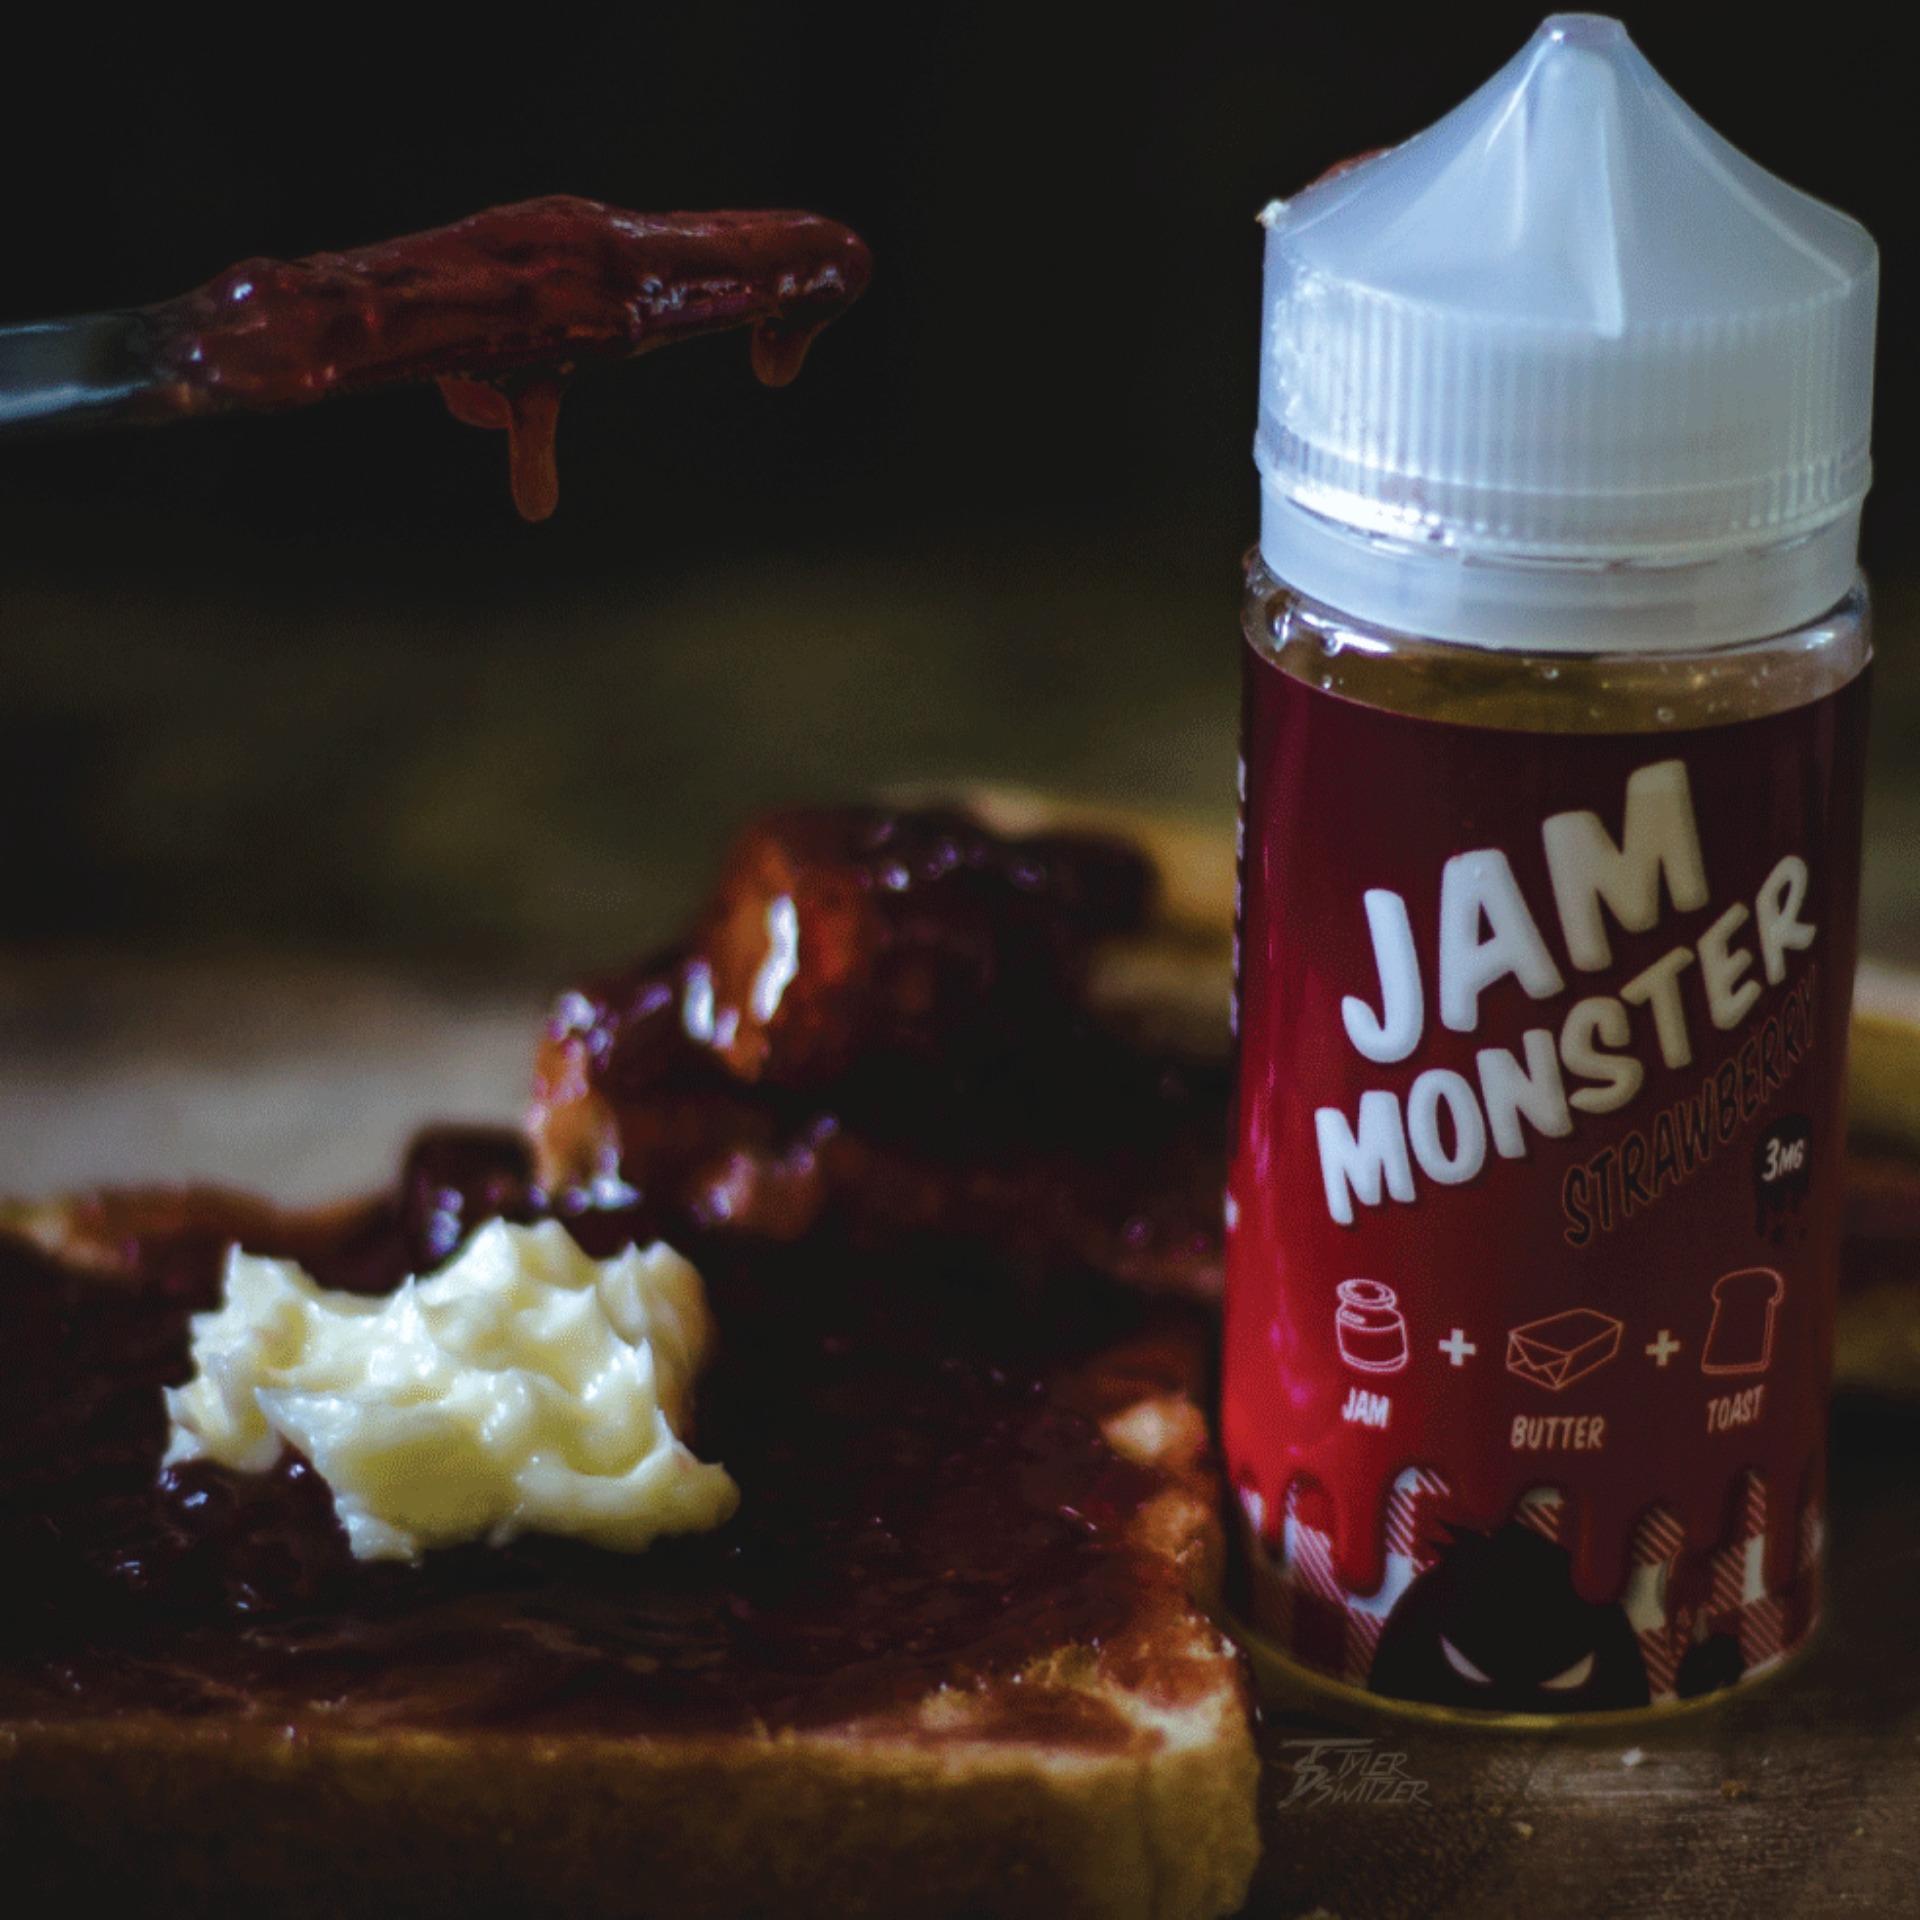 Flash Sale Best Premiium Liquid Usa Vape Vapor Vaporizer Giant E Tailored House 100ml Eliquid Snacker Doodle Jam Monster Strawberry Selai Roti